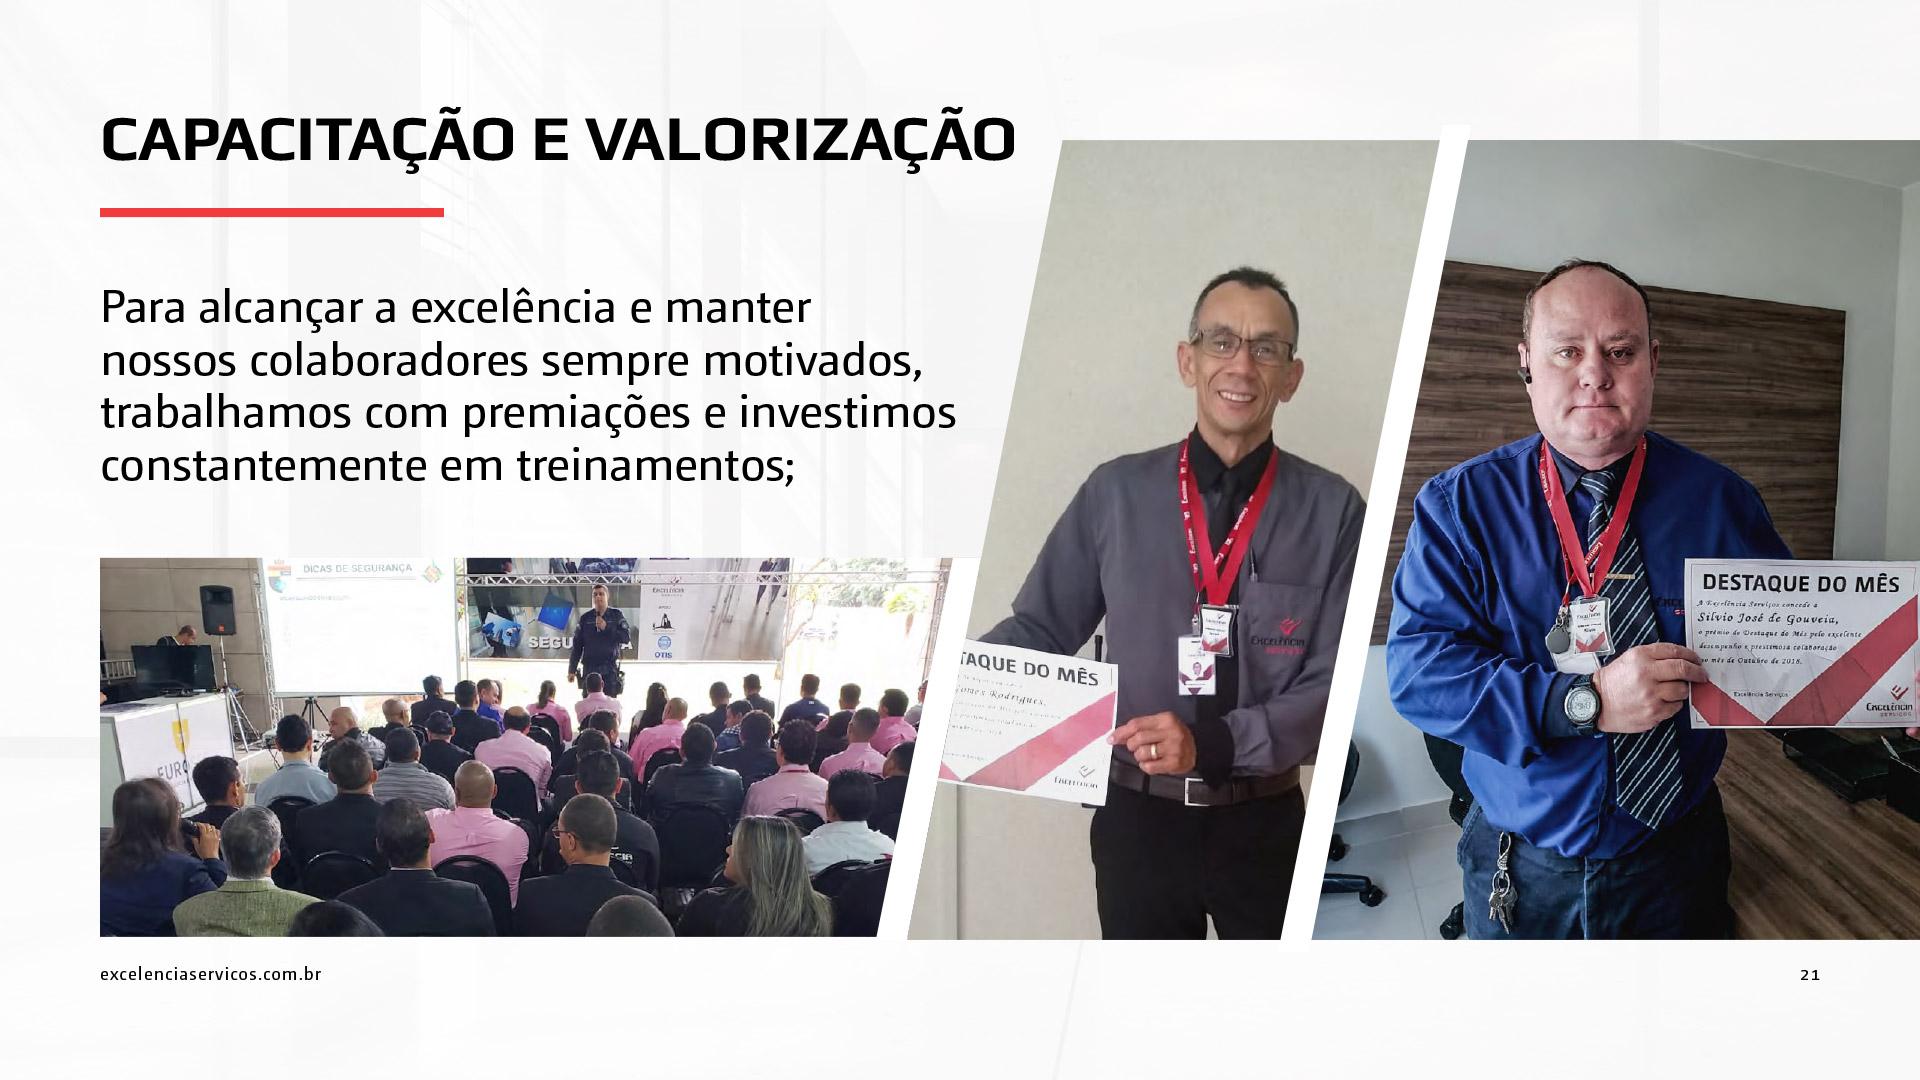 apresentacao-excelencia-21